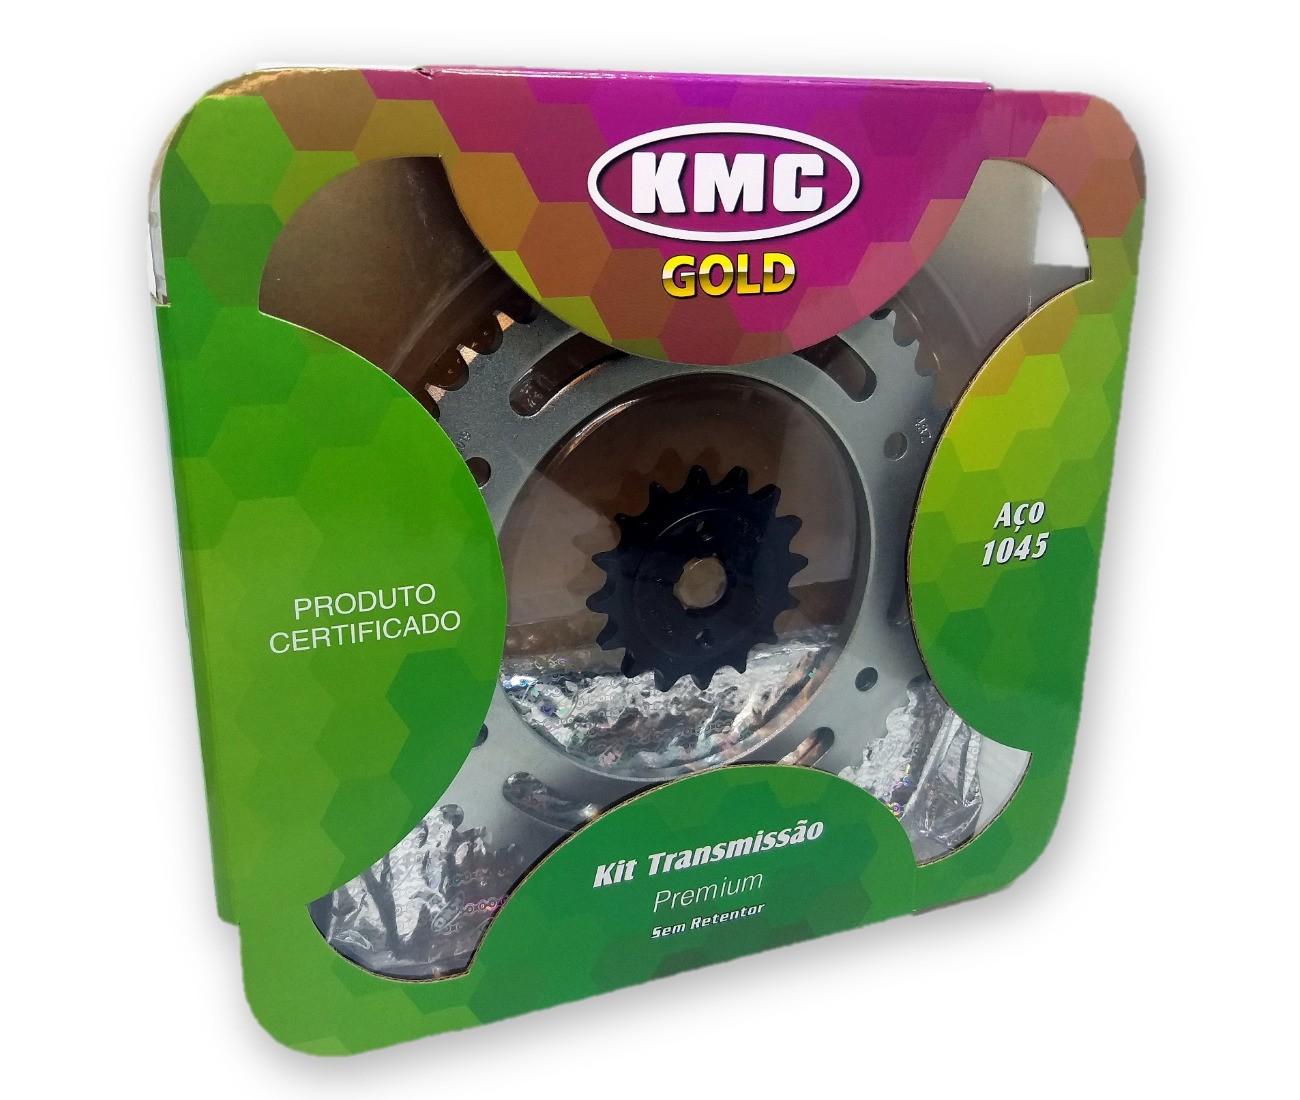 Kit Relação Bros 160 / XRE 190 1045 KMC GOLD 428x128x48x16